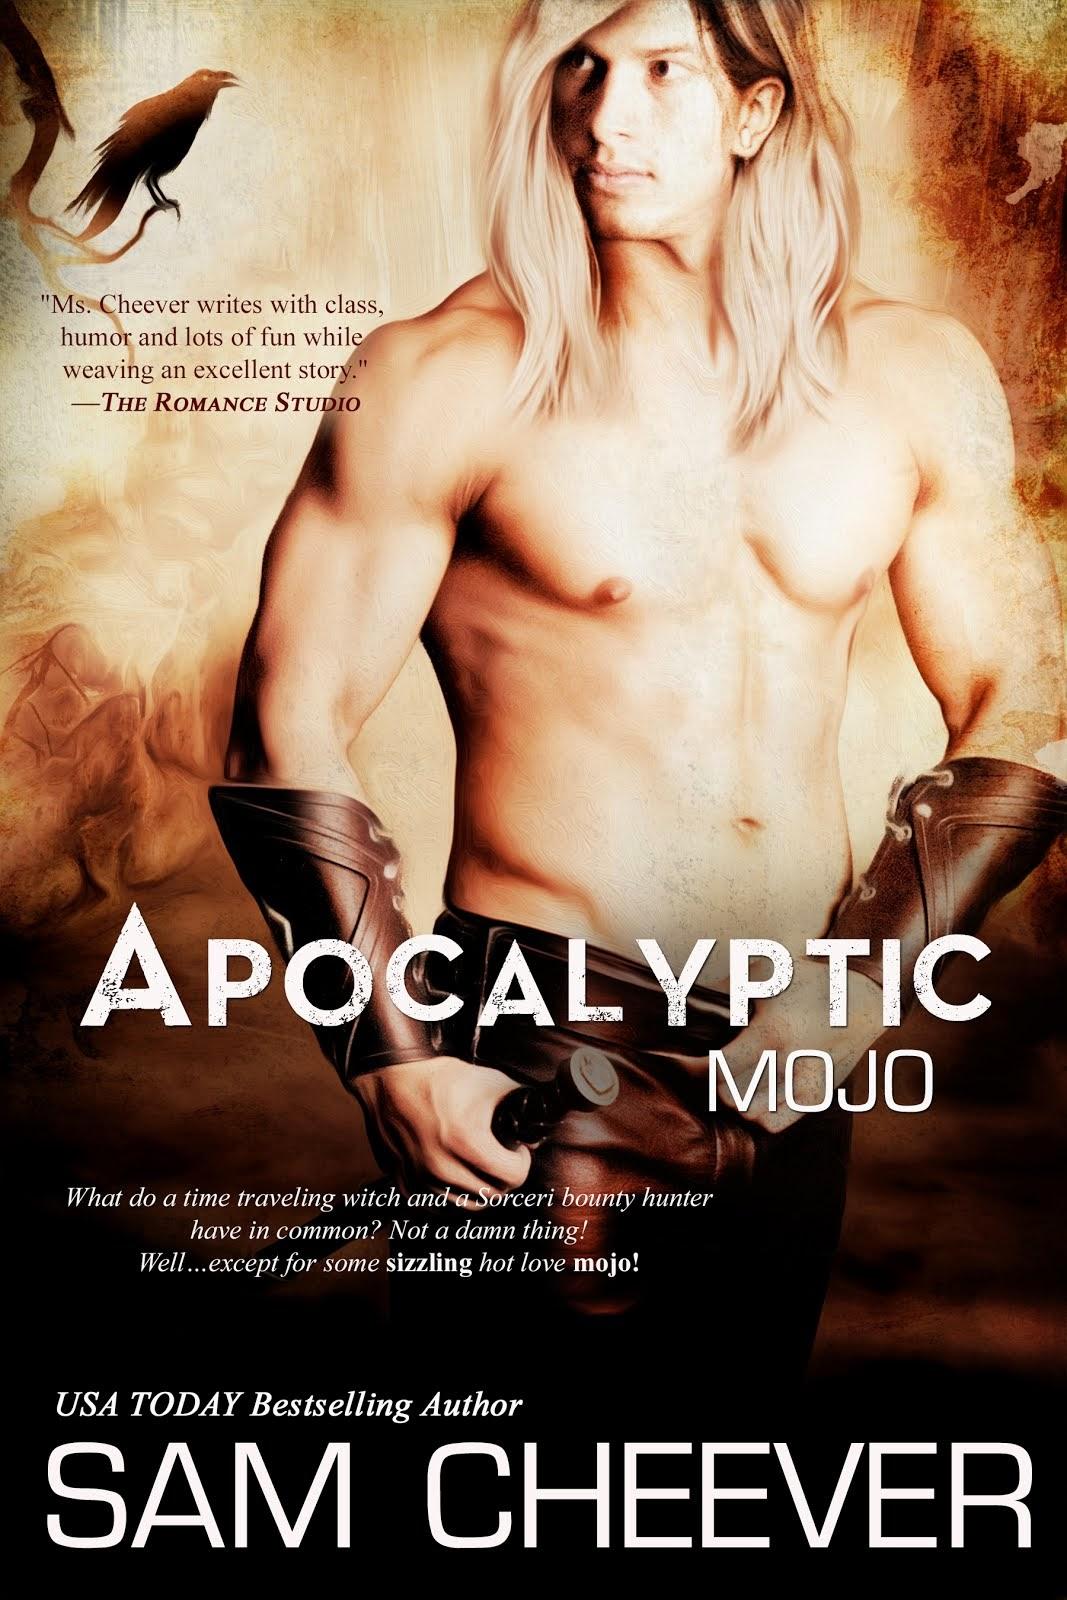 Apocalyptic Mojo